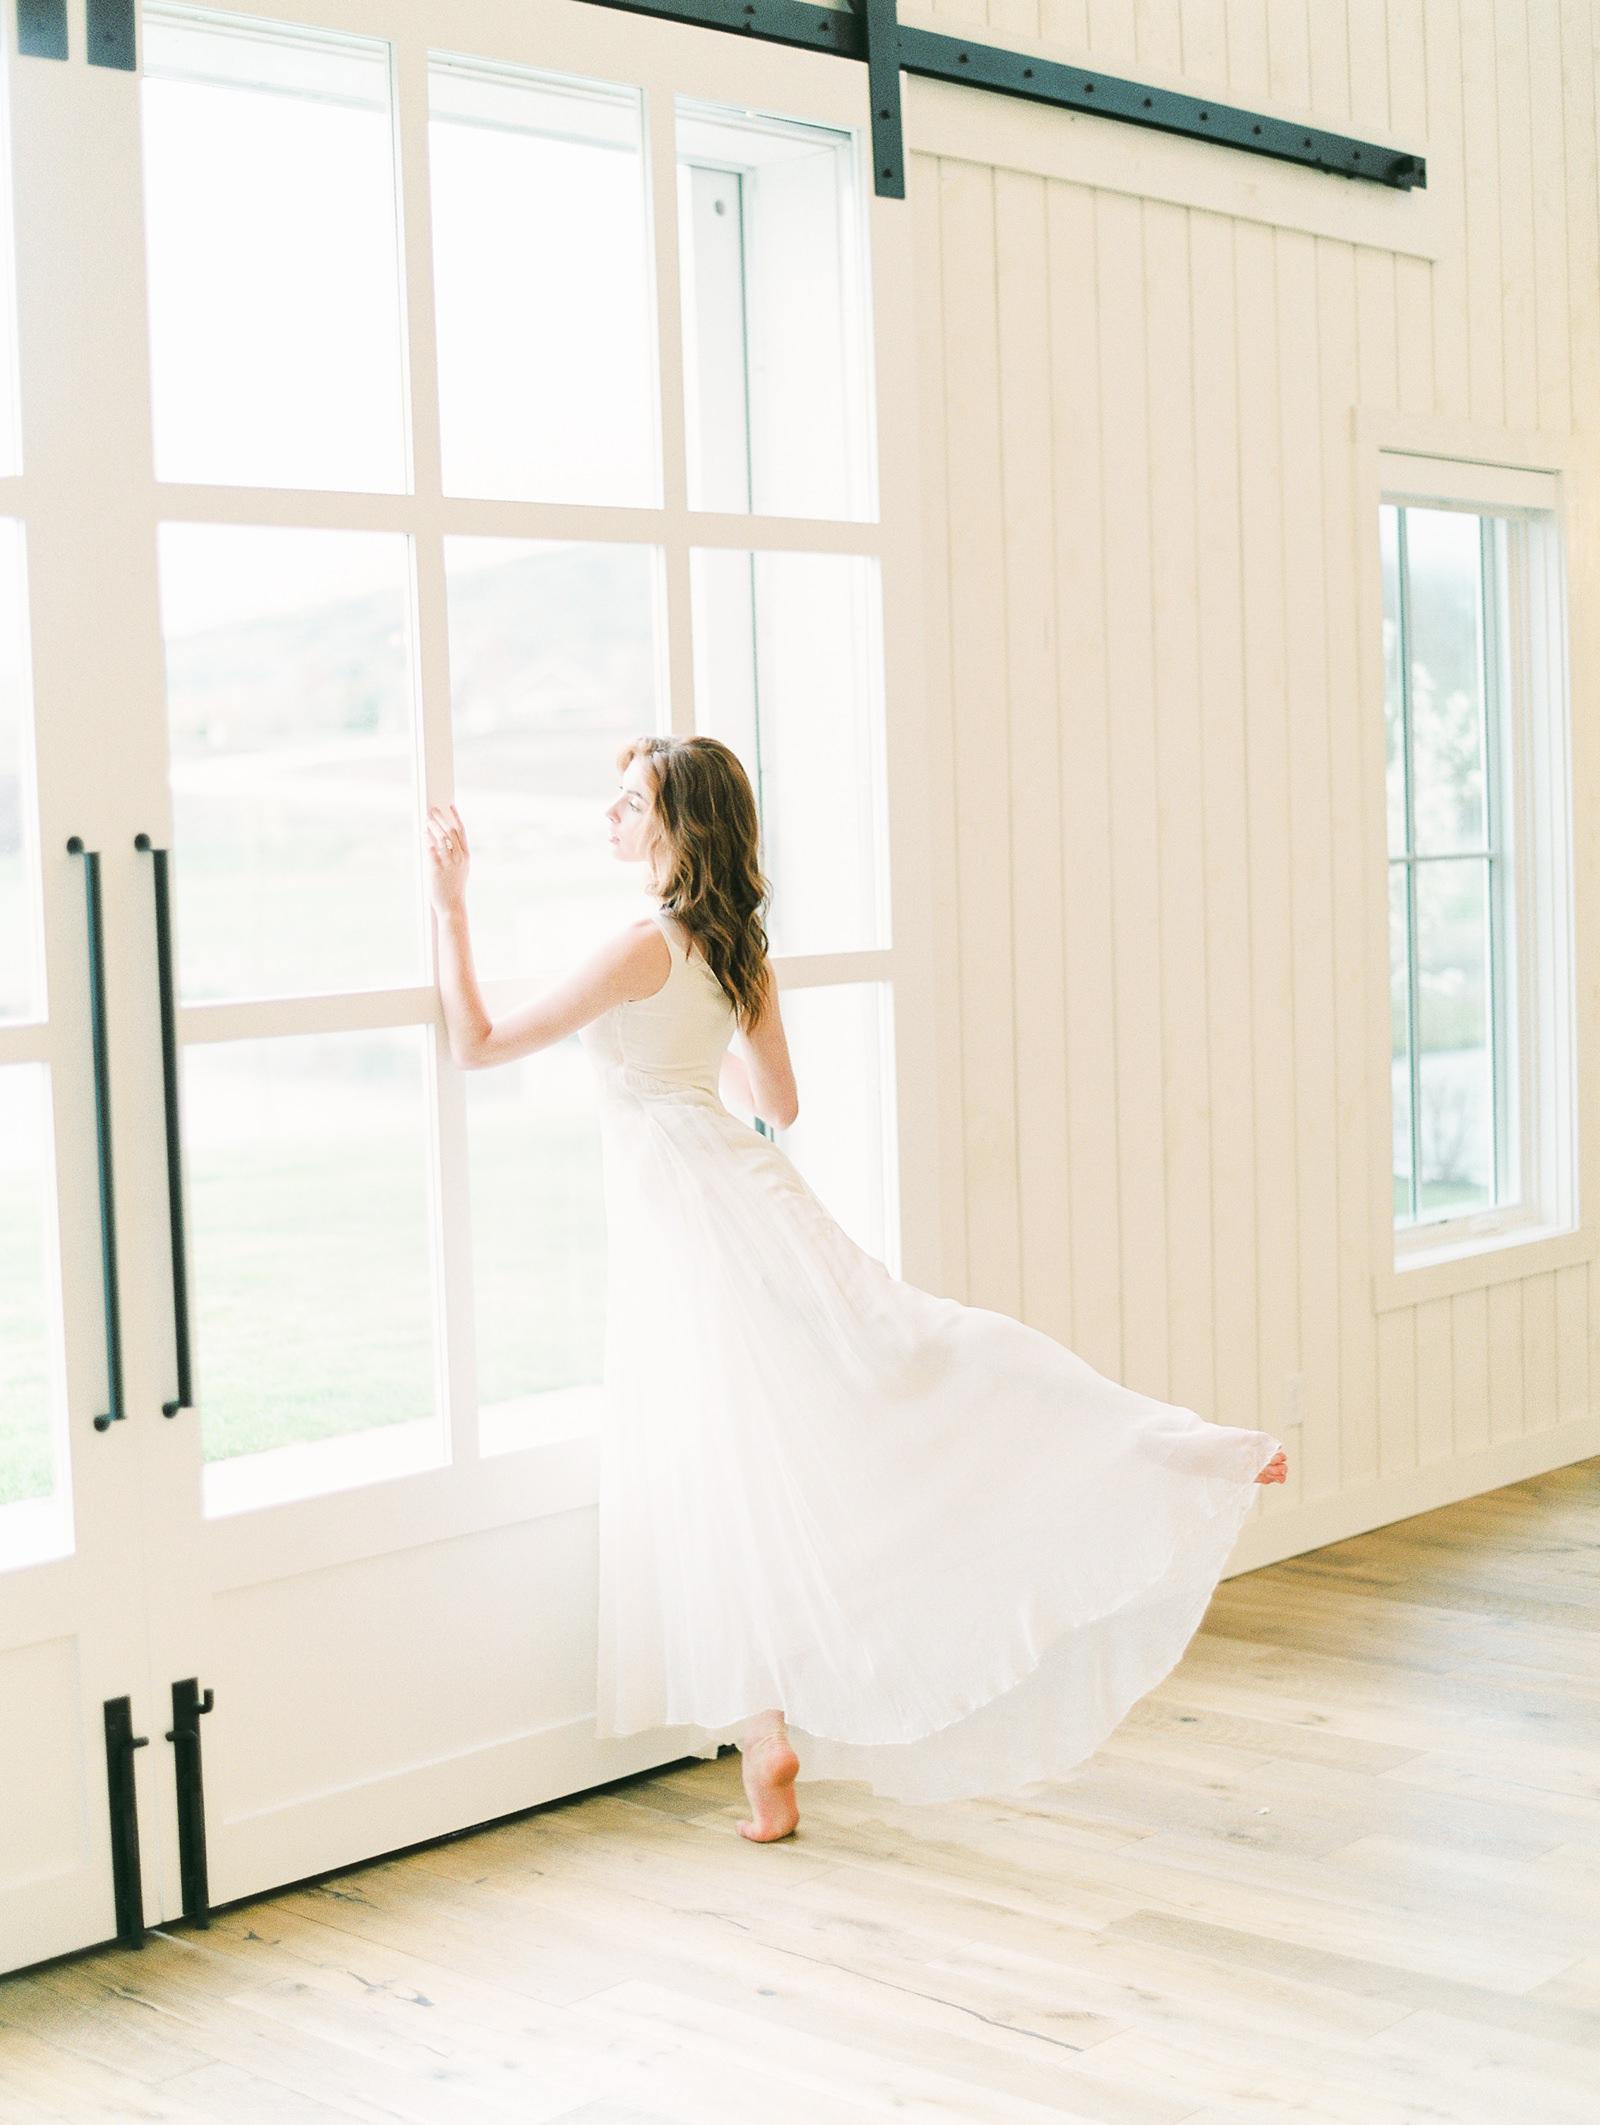 Heber Valley Natural Organic Wedding Inspiration at River Bottoms Ranch, Utah wedding photography, simple white flowy wedding dress ballerina bride